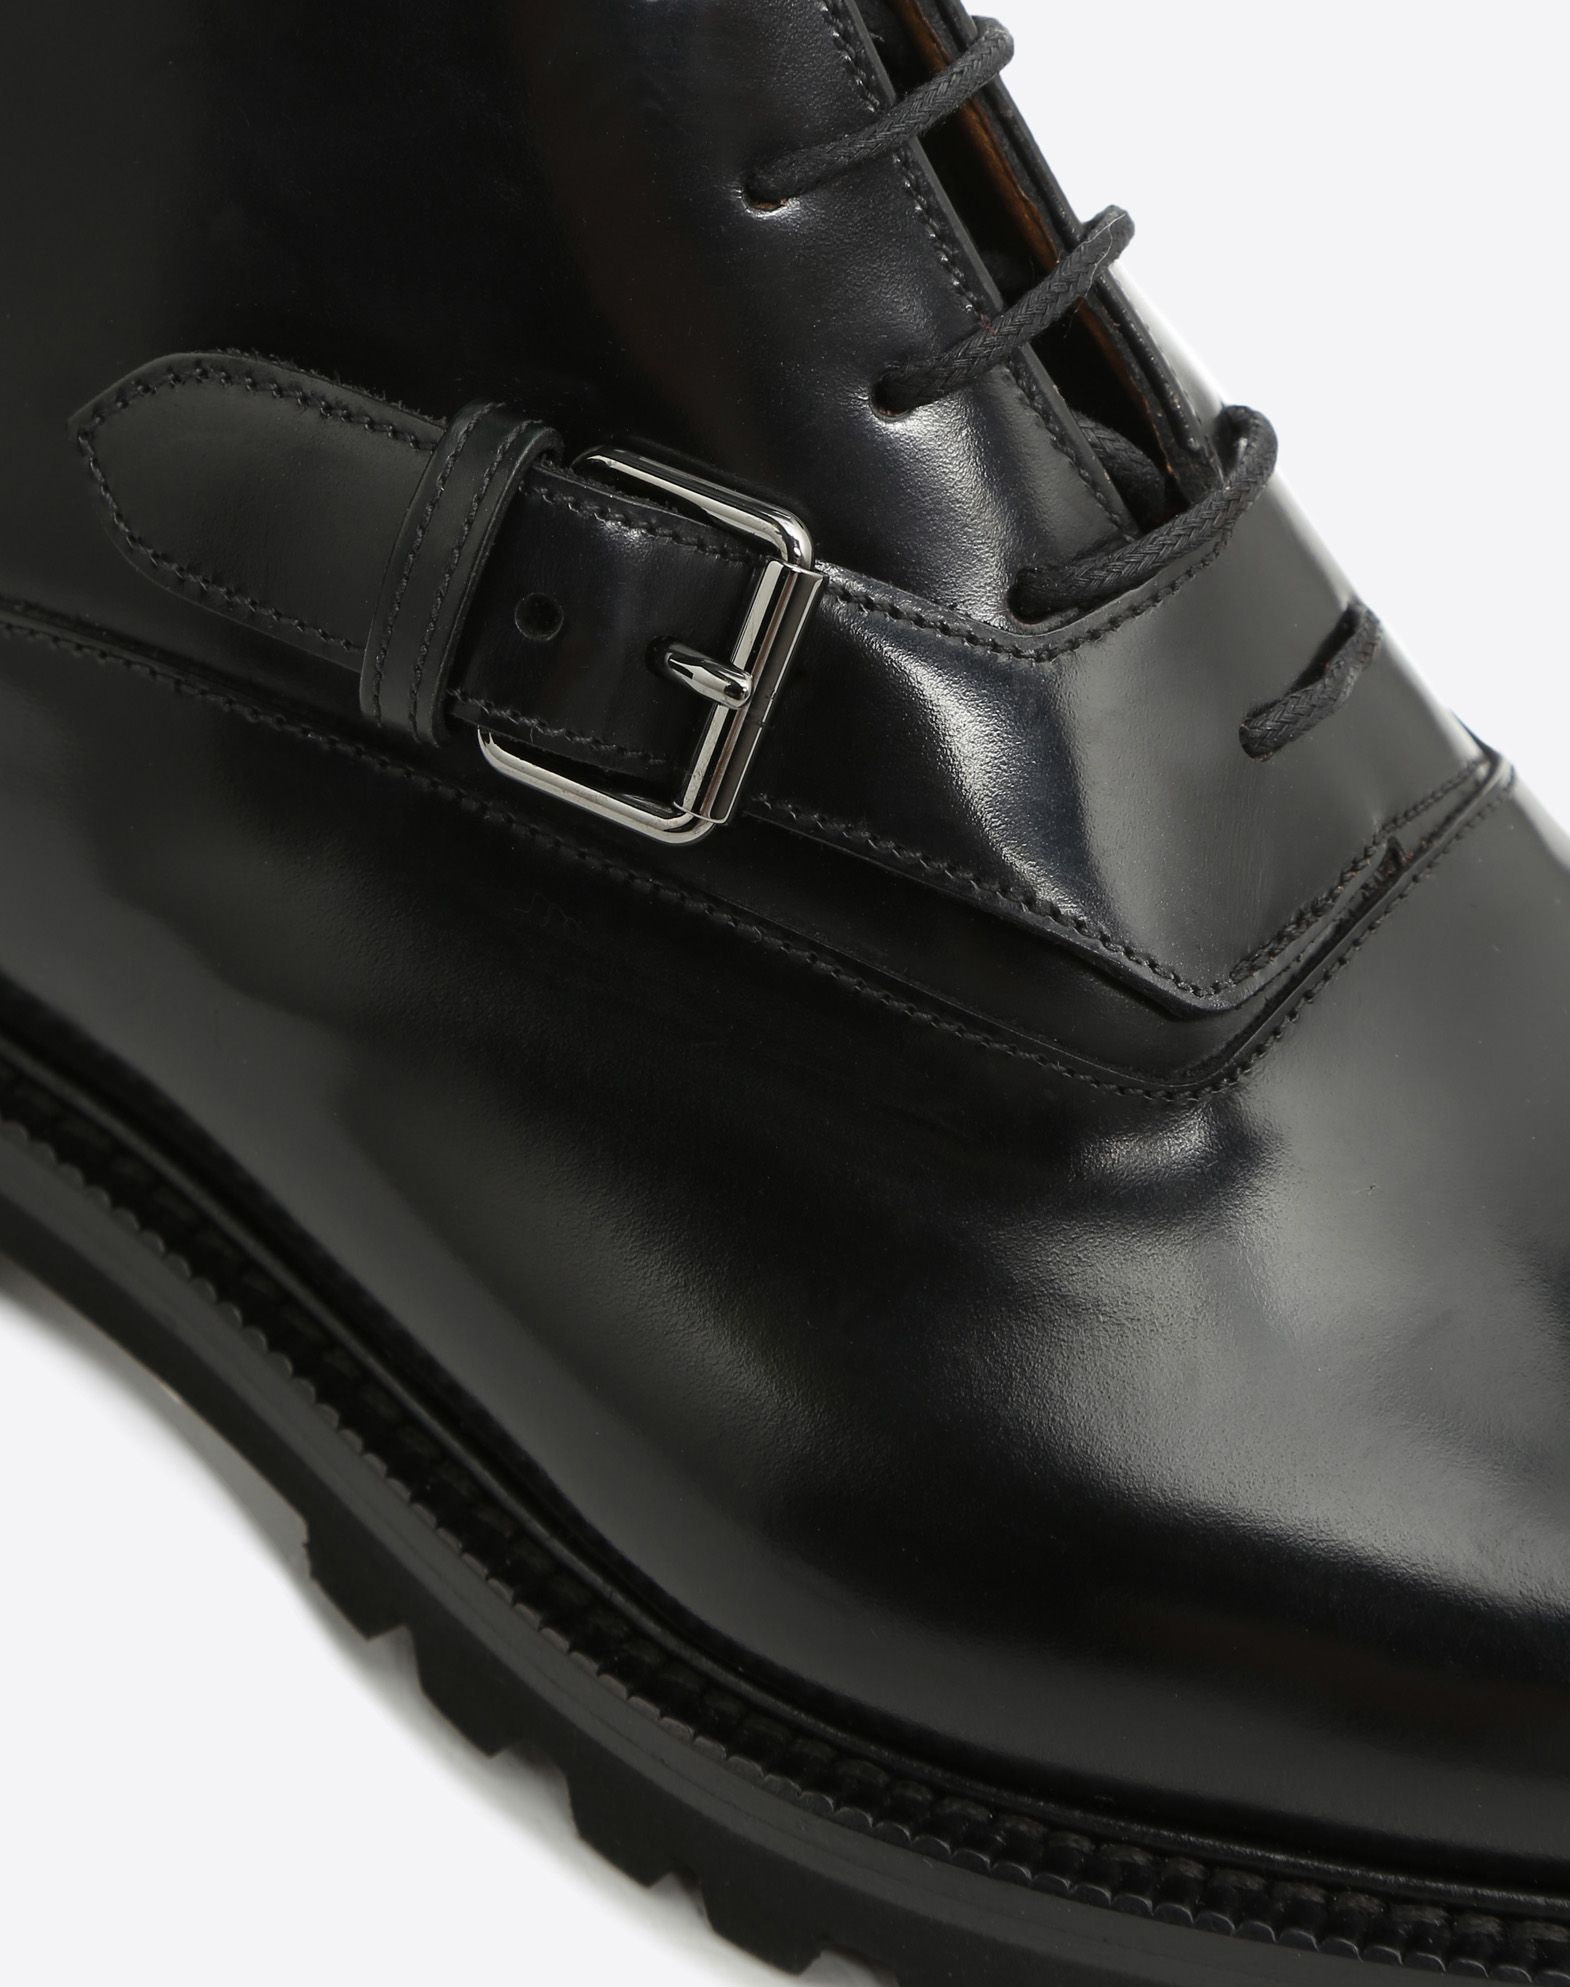 VALENTINO GARAVANI UOMO 靴子 短靴 U b